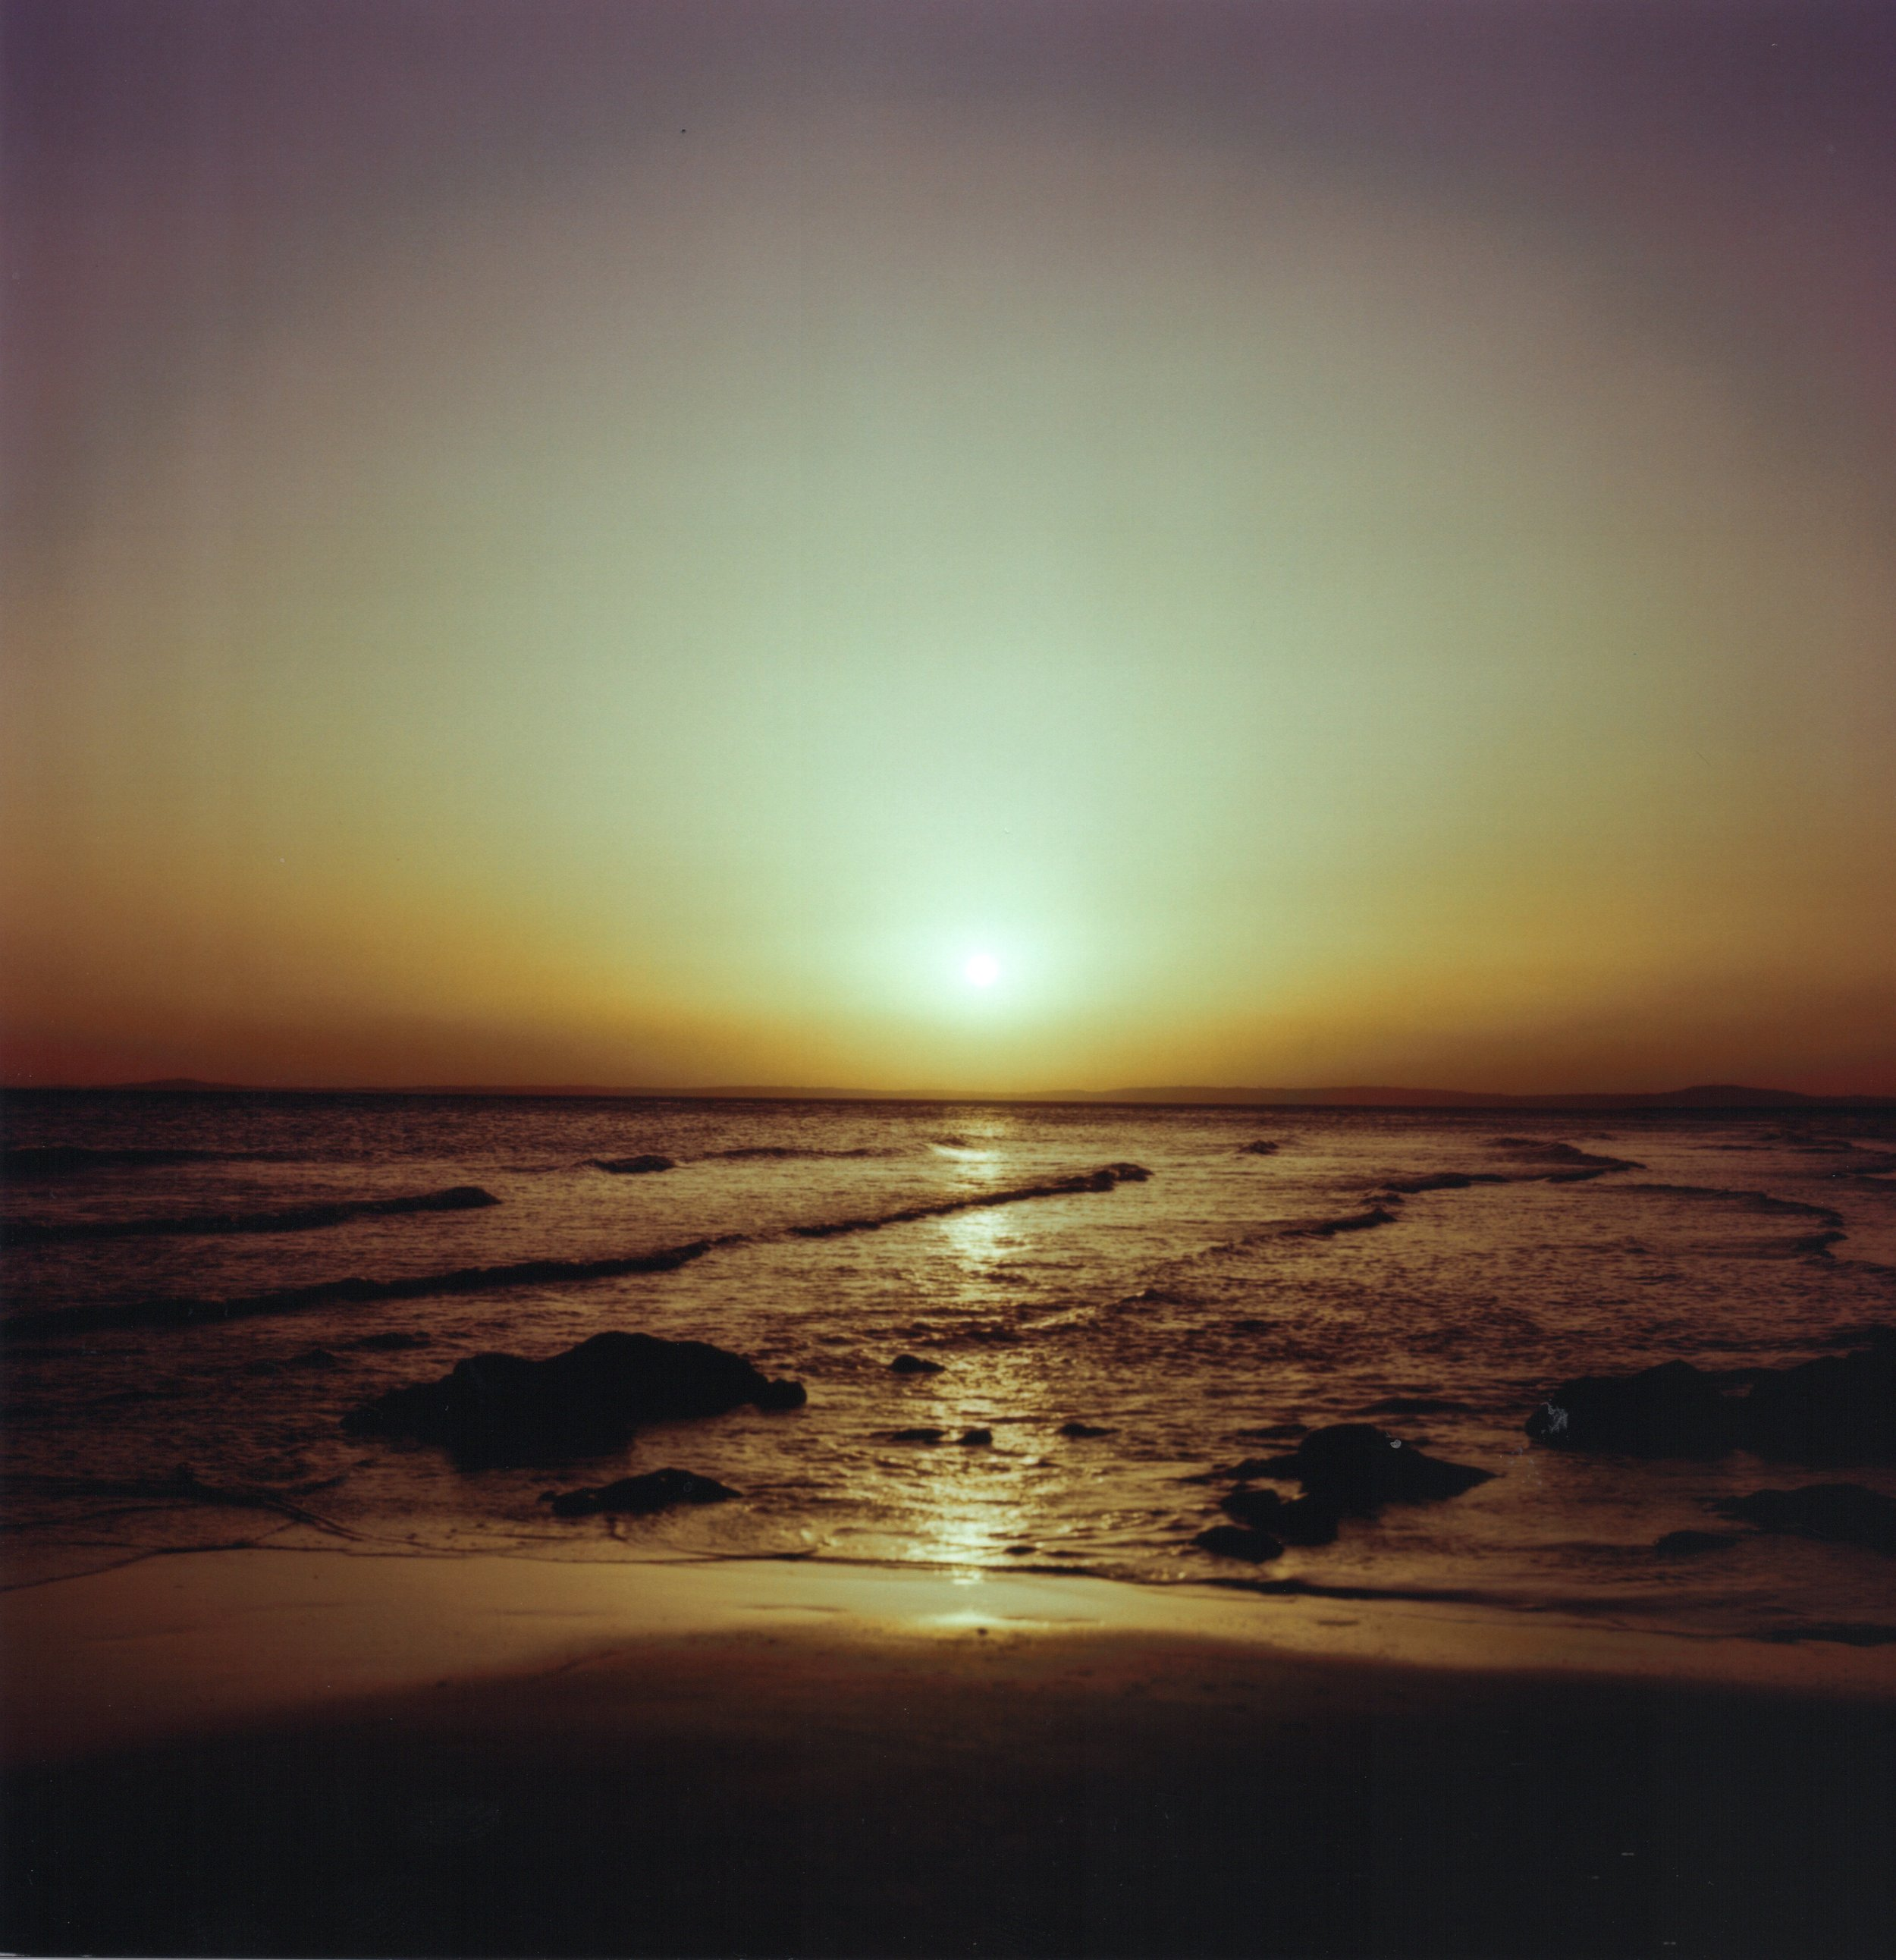 Rest Bay at sunset. Zenza Bronica, Kodak Ektar 100.